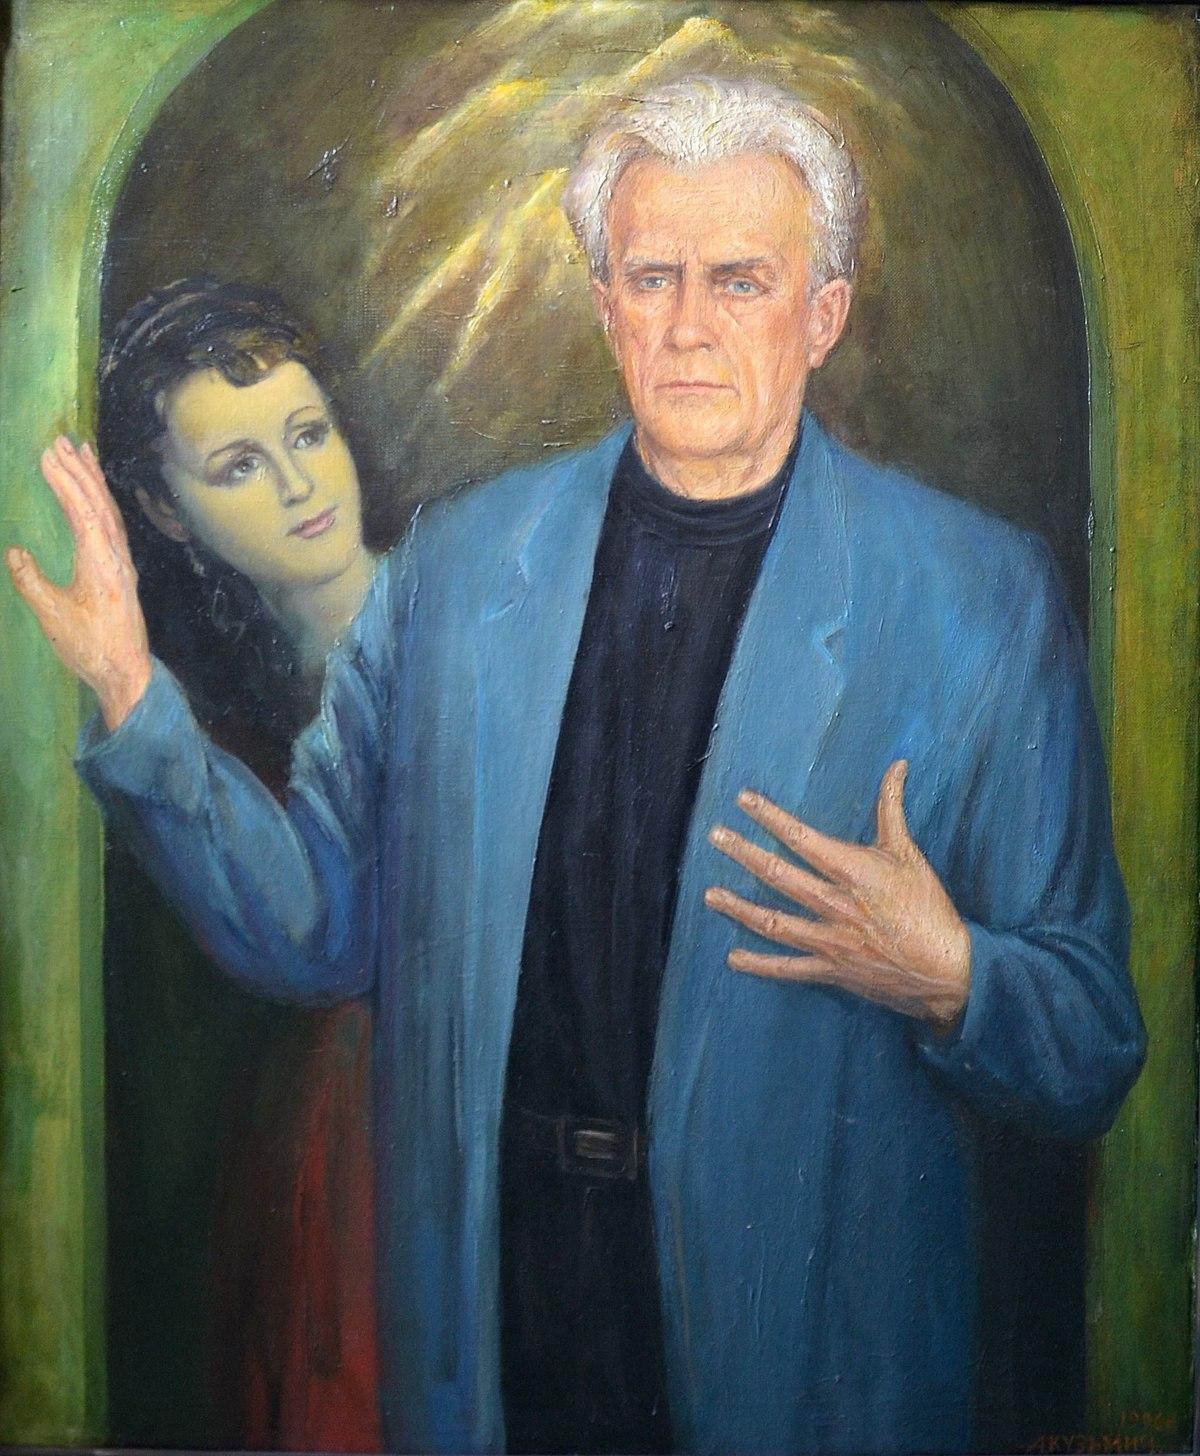 Nikolai Eremenko Jr.: biography, best movies, personal life 95